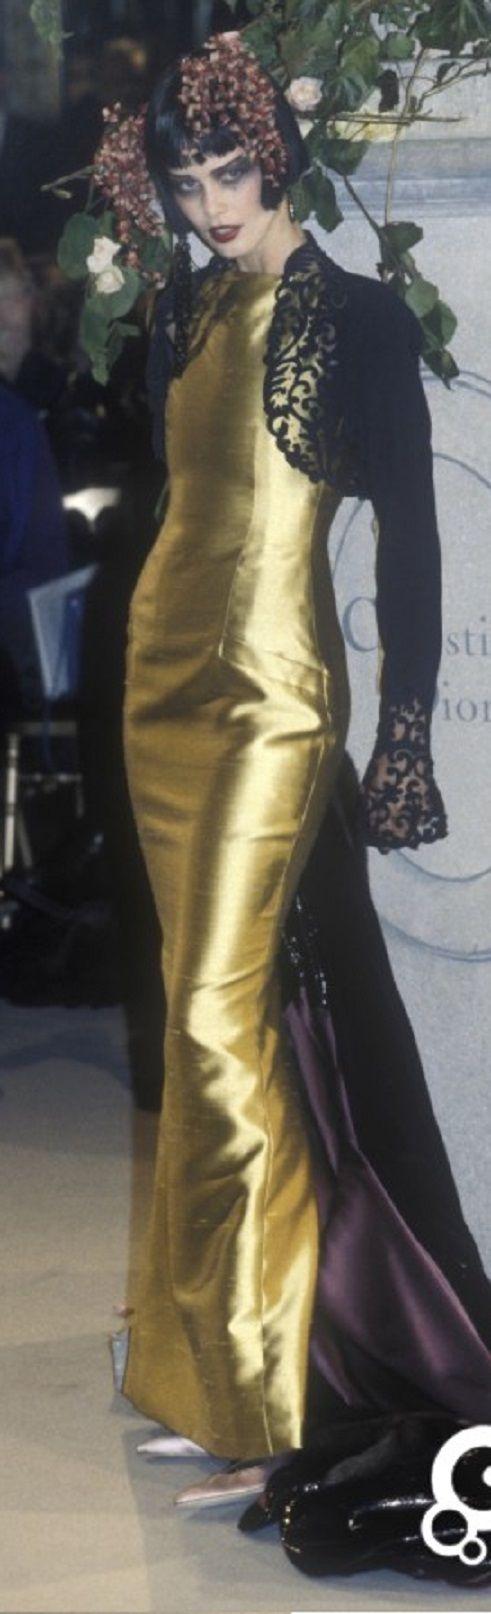 Dior Haute Couture spring - summer 1997 - John Galliano